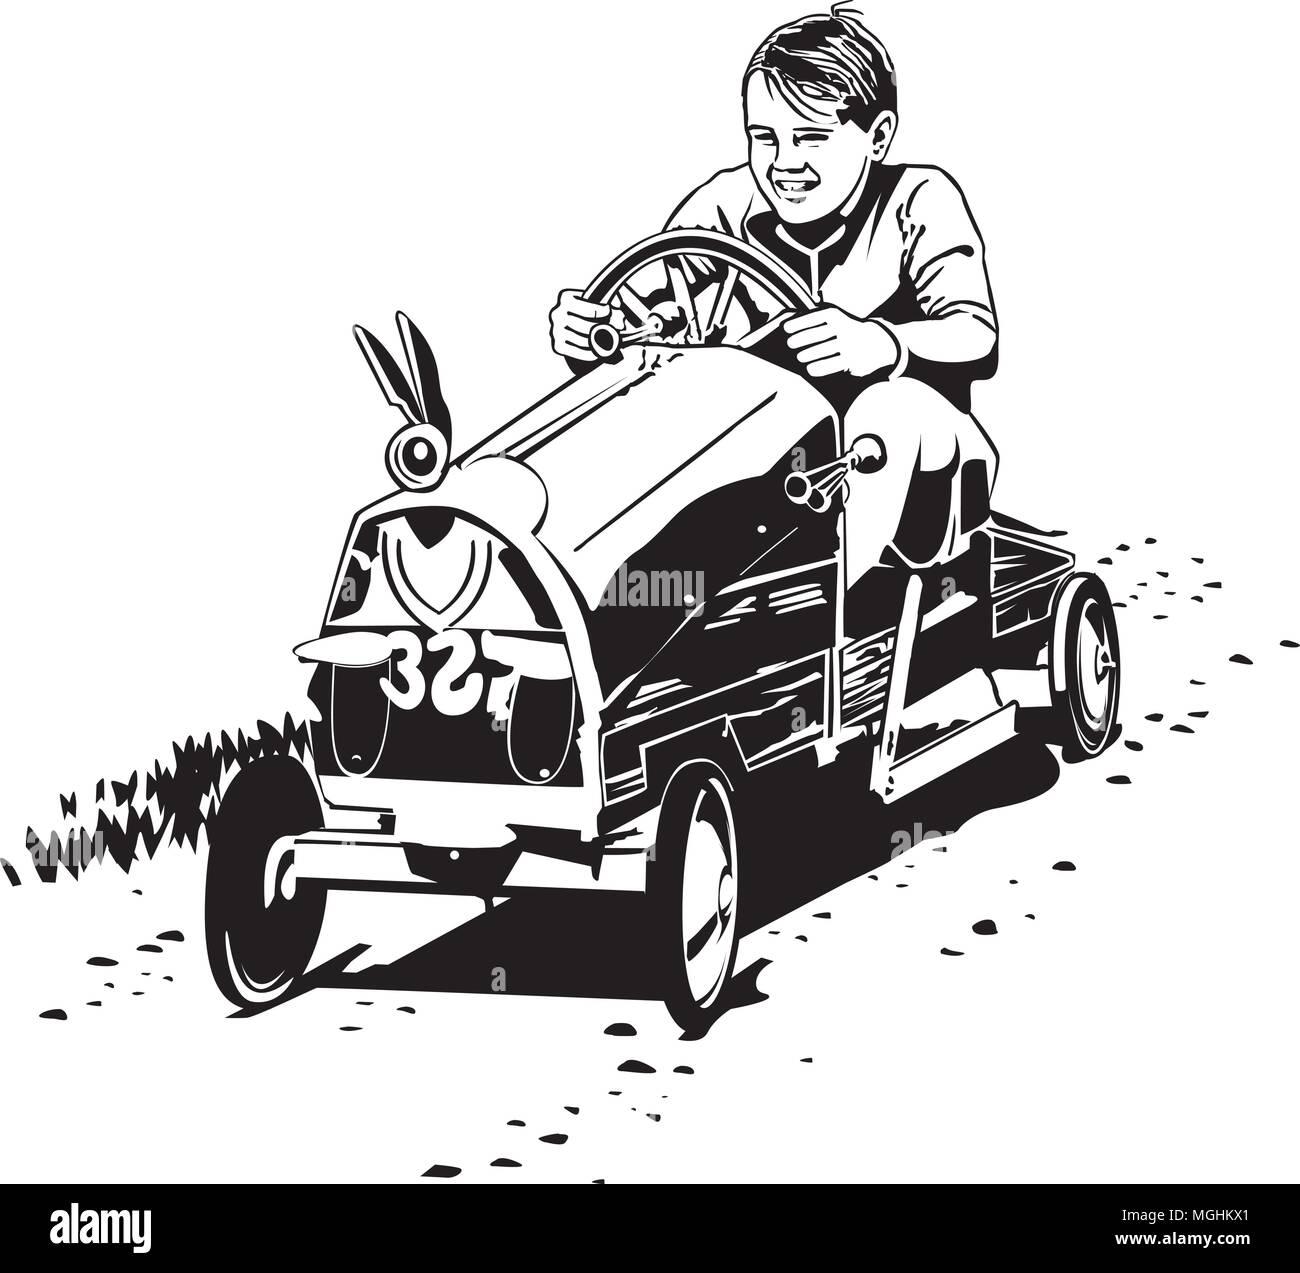 soapbox racer retro clipart illustration stock vector art